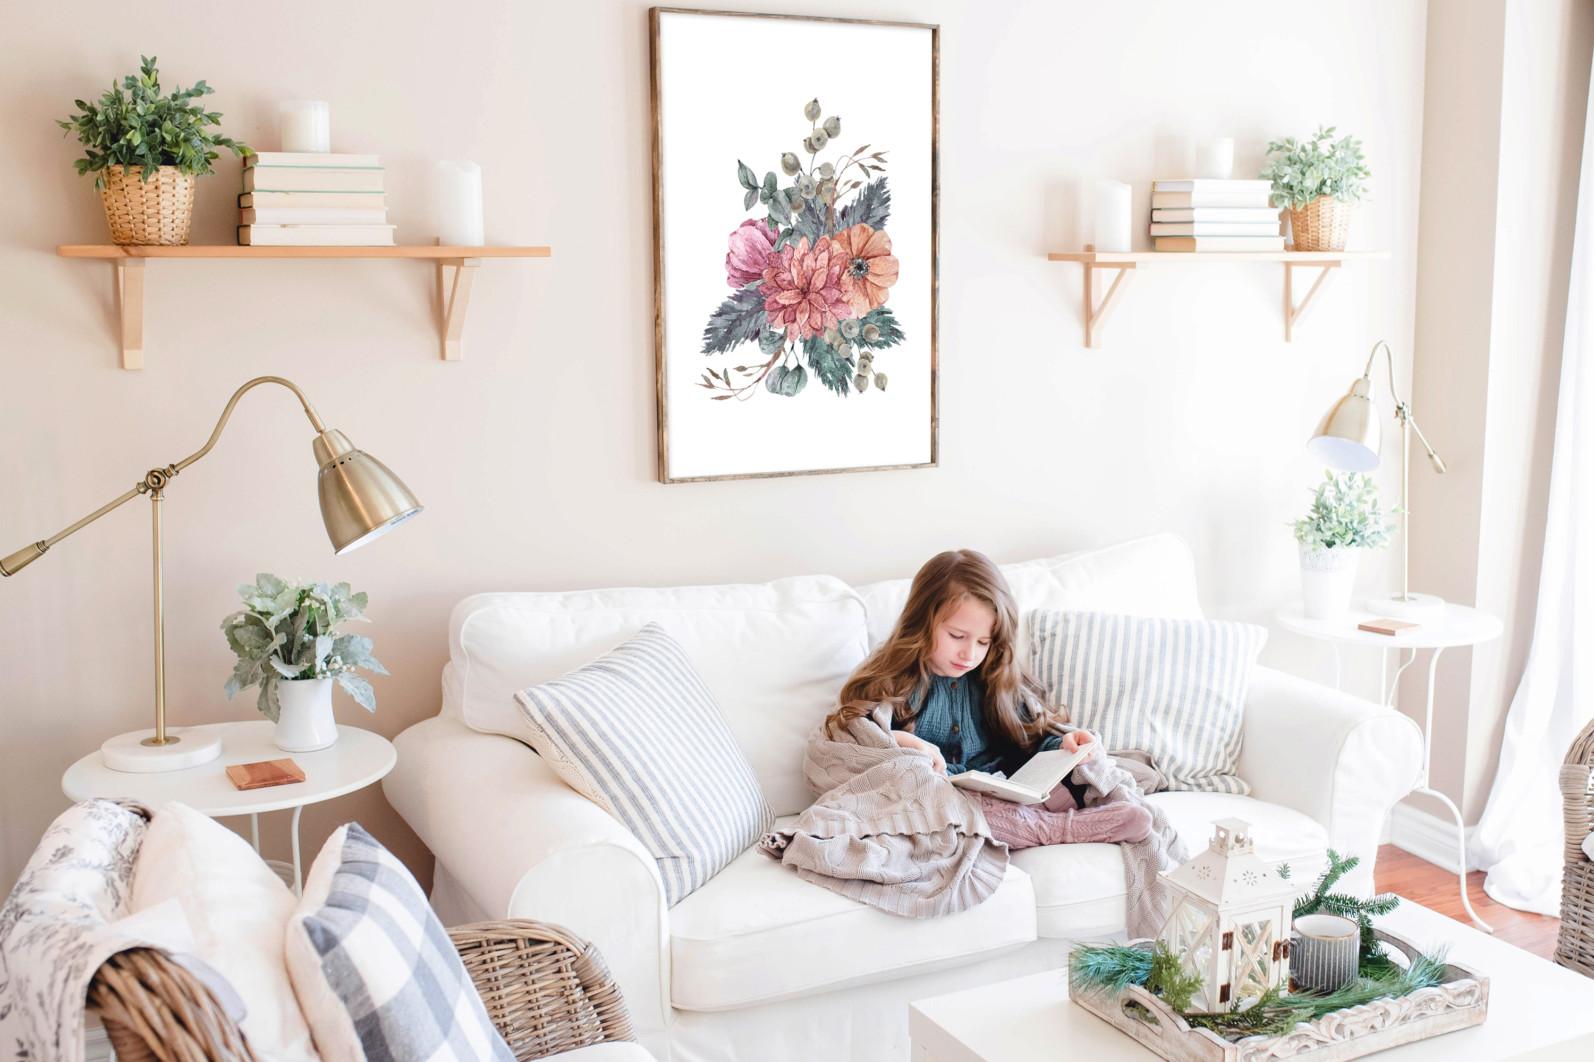 Floral bouquets sublimation / clipart- 3 png files - Free Elegant Room Interior Frame Mockup PSD 2019 scaled -